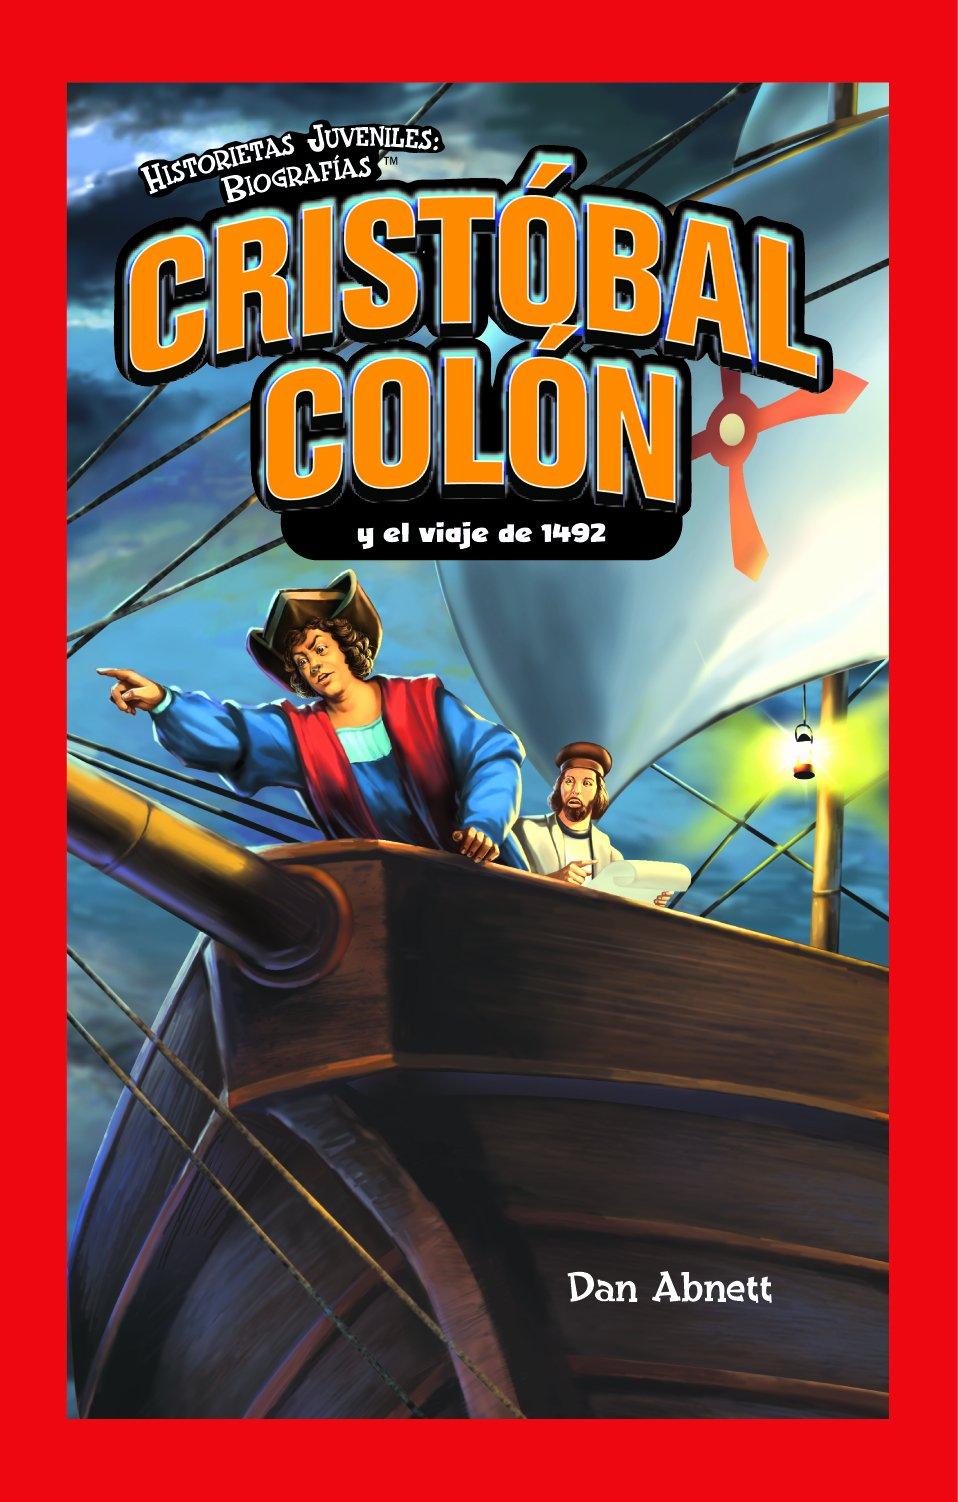 cristobal-colon-y-el-viaje-de-1492-christopher-columbus-and-the-voyage-of-1492-historietas-juveniles-biografias-jr-graphic-biographies-spanish-edition